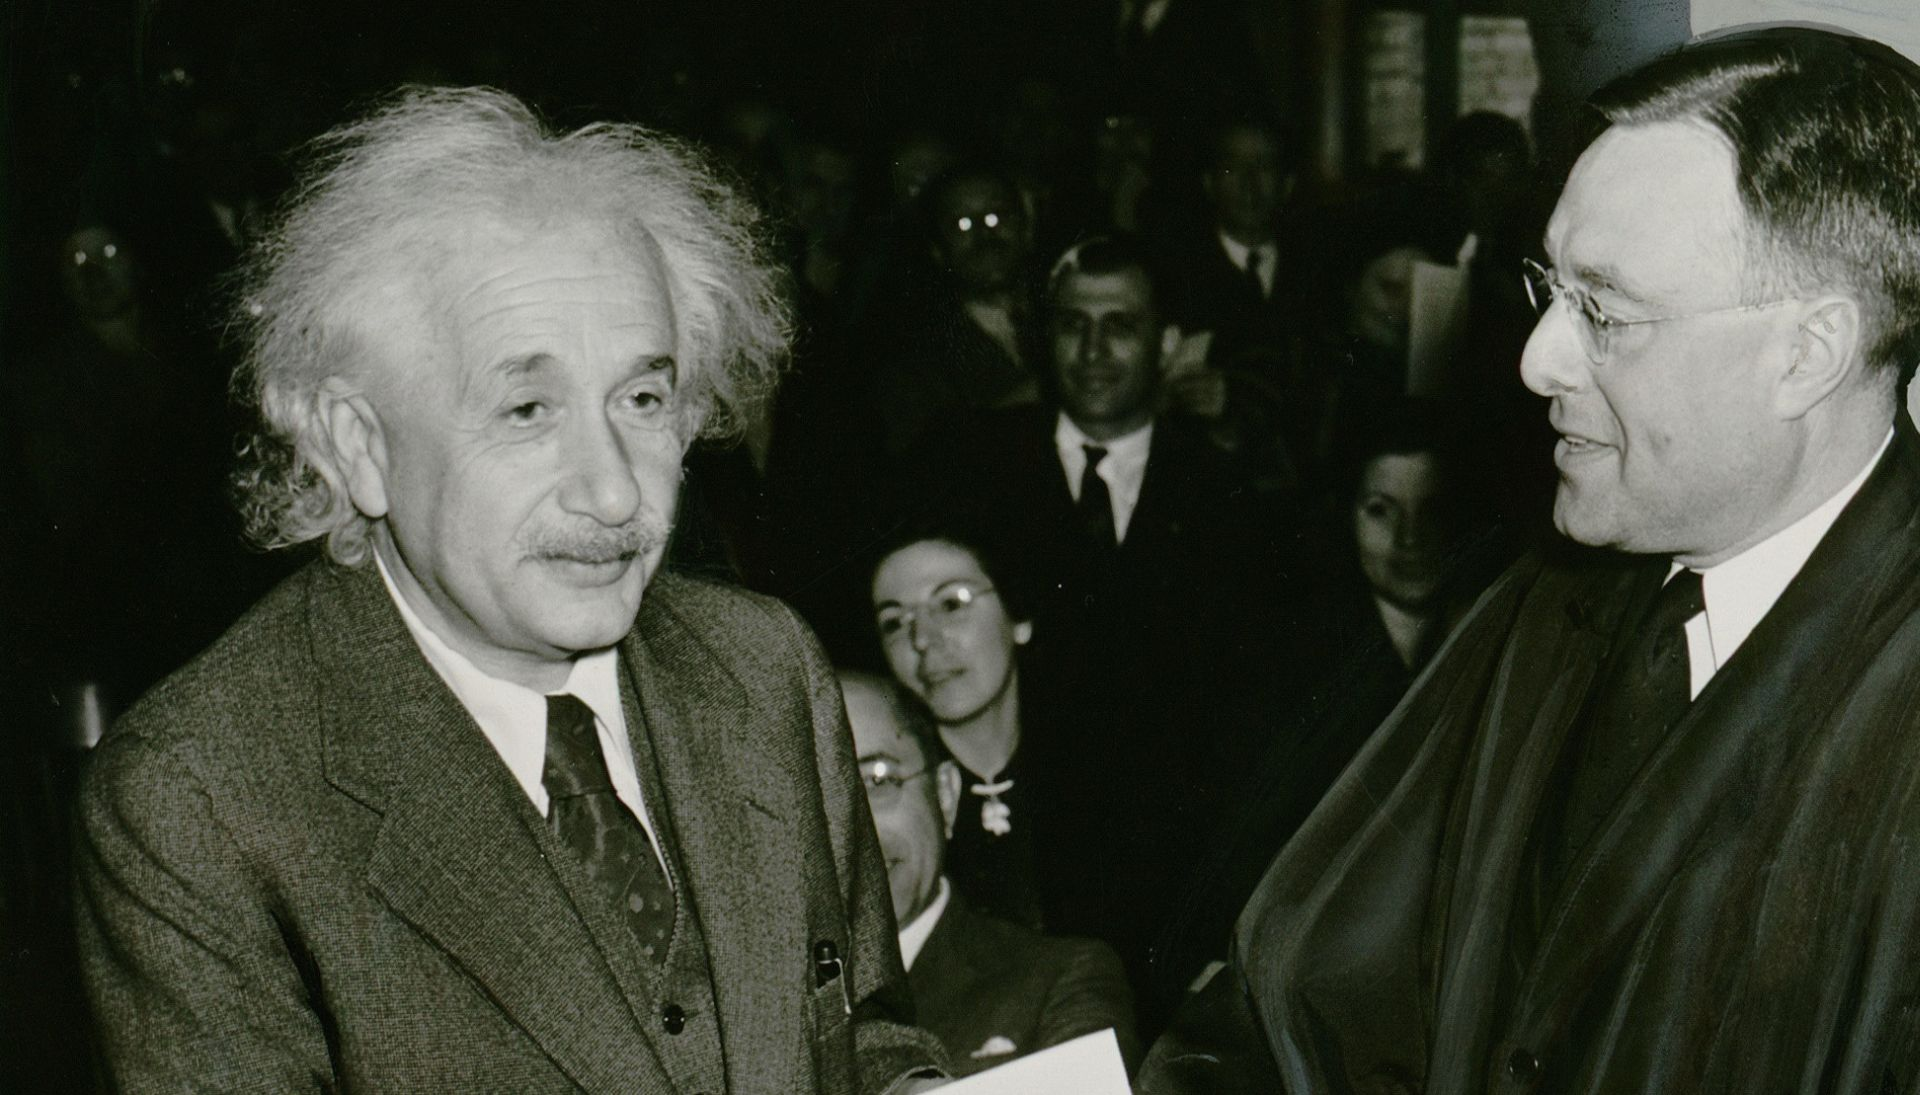 'GENIUS' Oskarovac Geoffrey Rush glumit će Alberta Einsteina u novoj seriji National Geographica